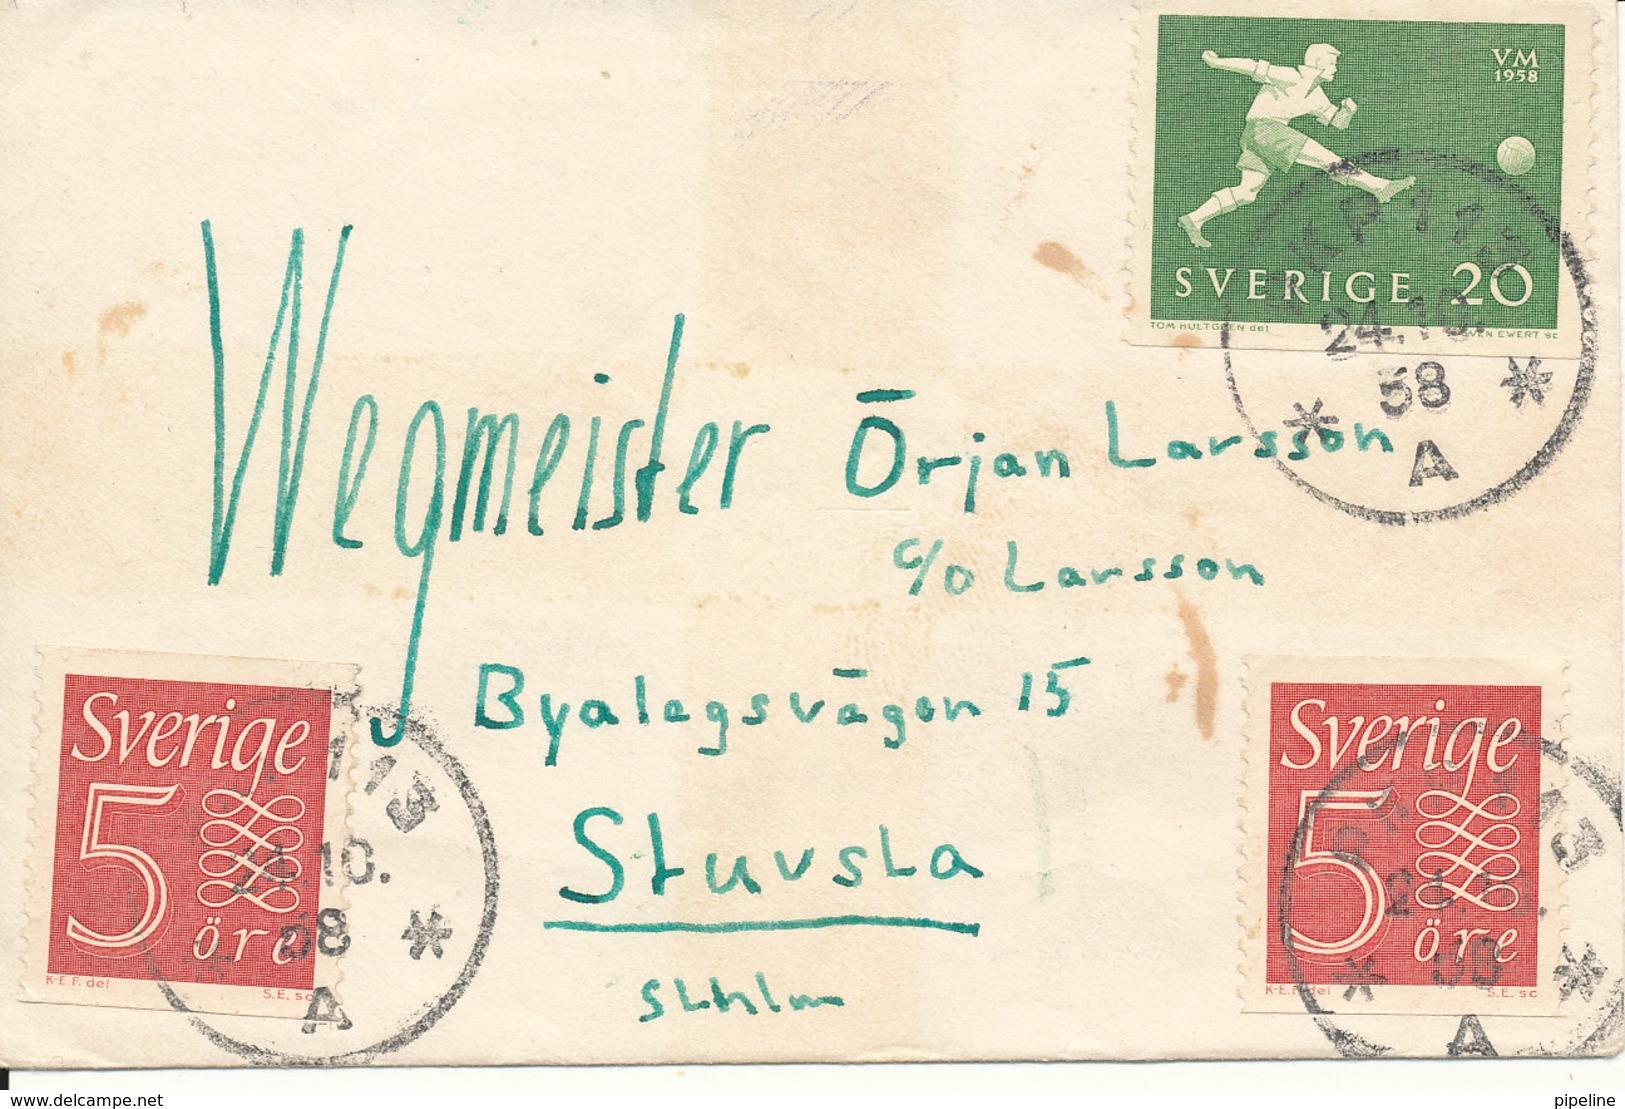 Sweden Small Cover PKP 113 24-10-1958 - Sweden